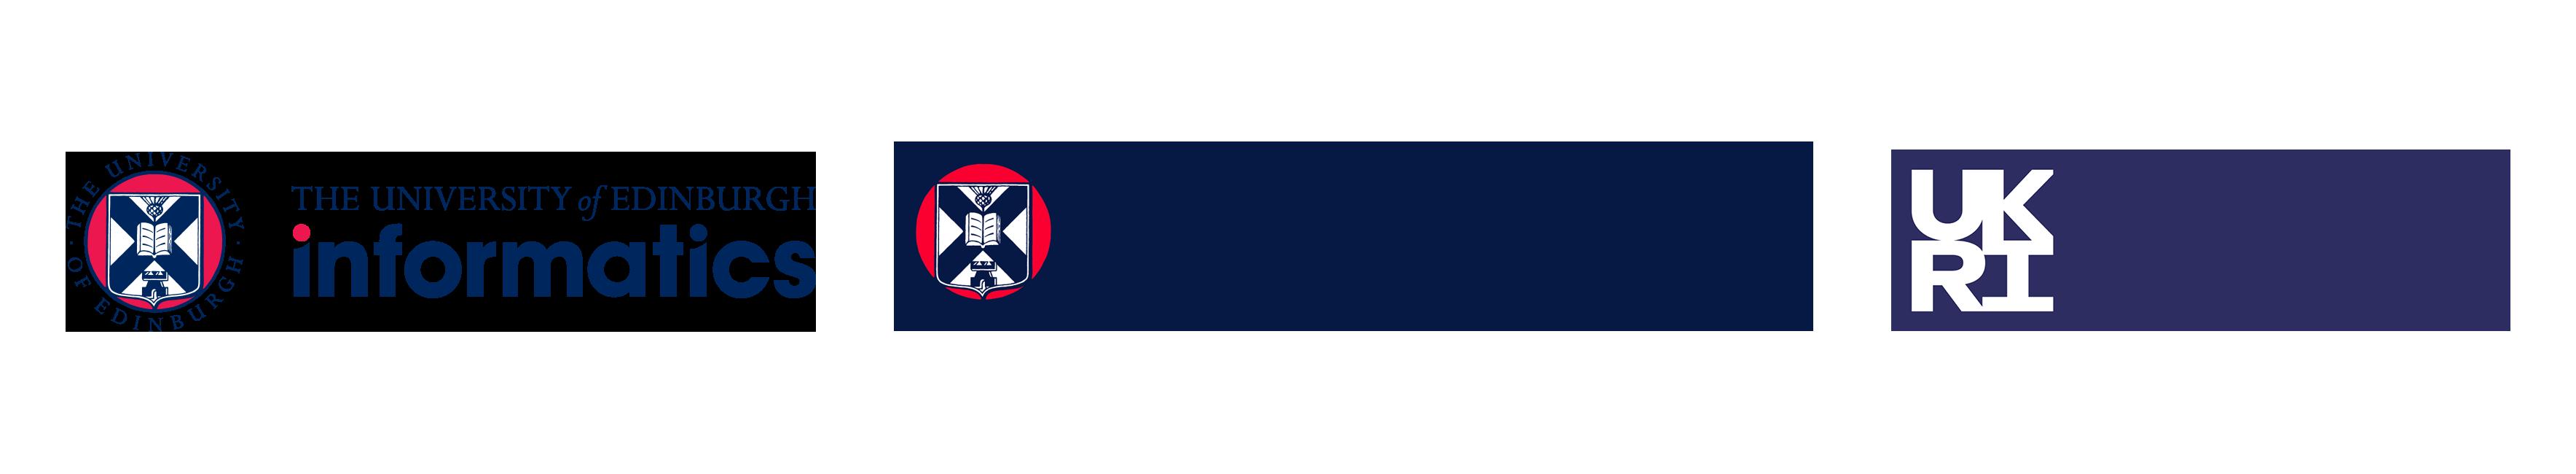 School of informatics, CDT NLP and UKRI logos